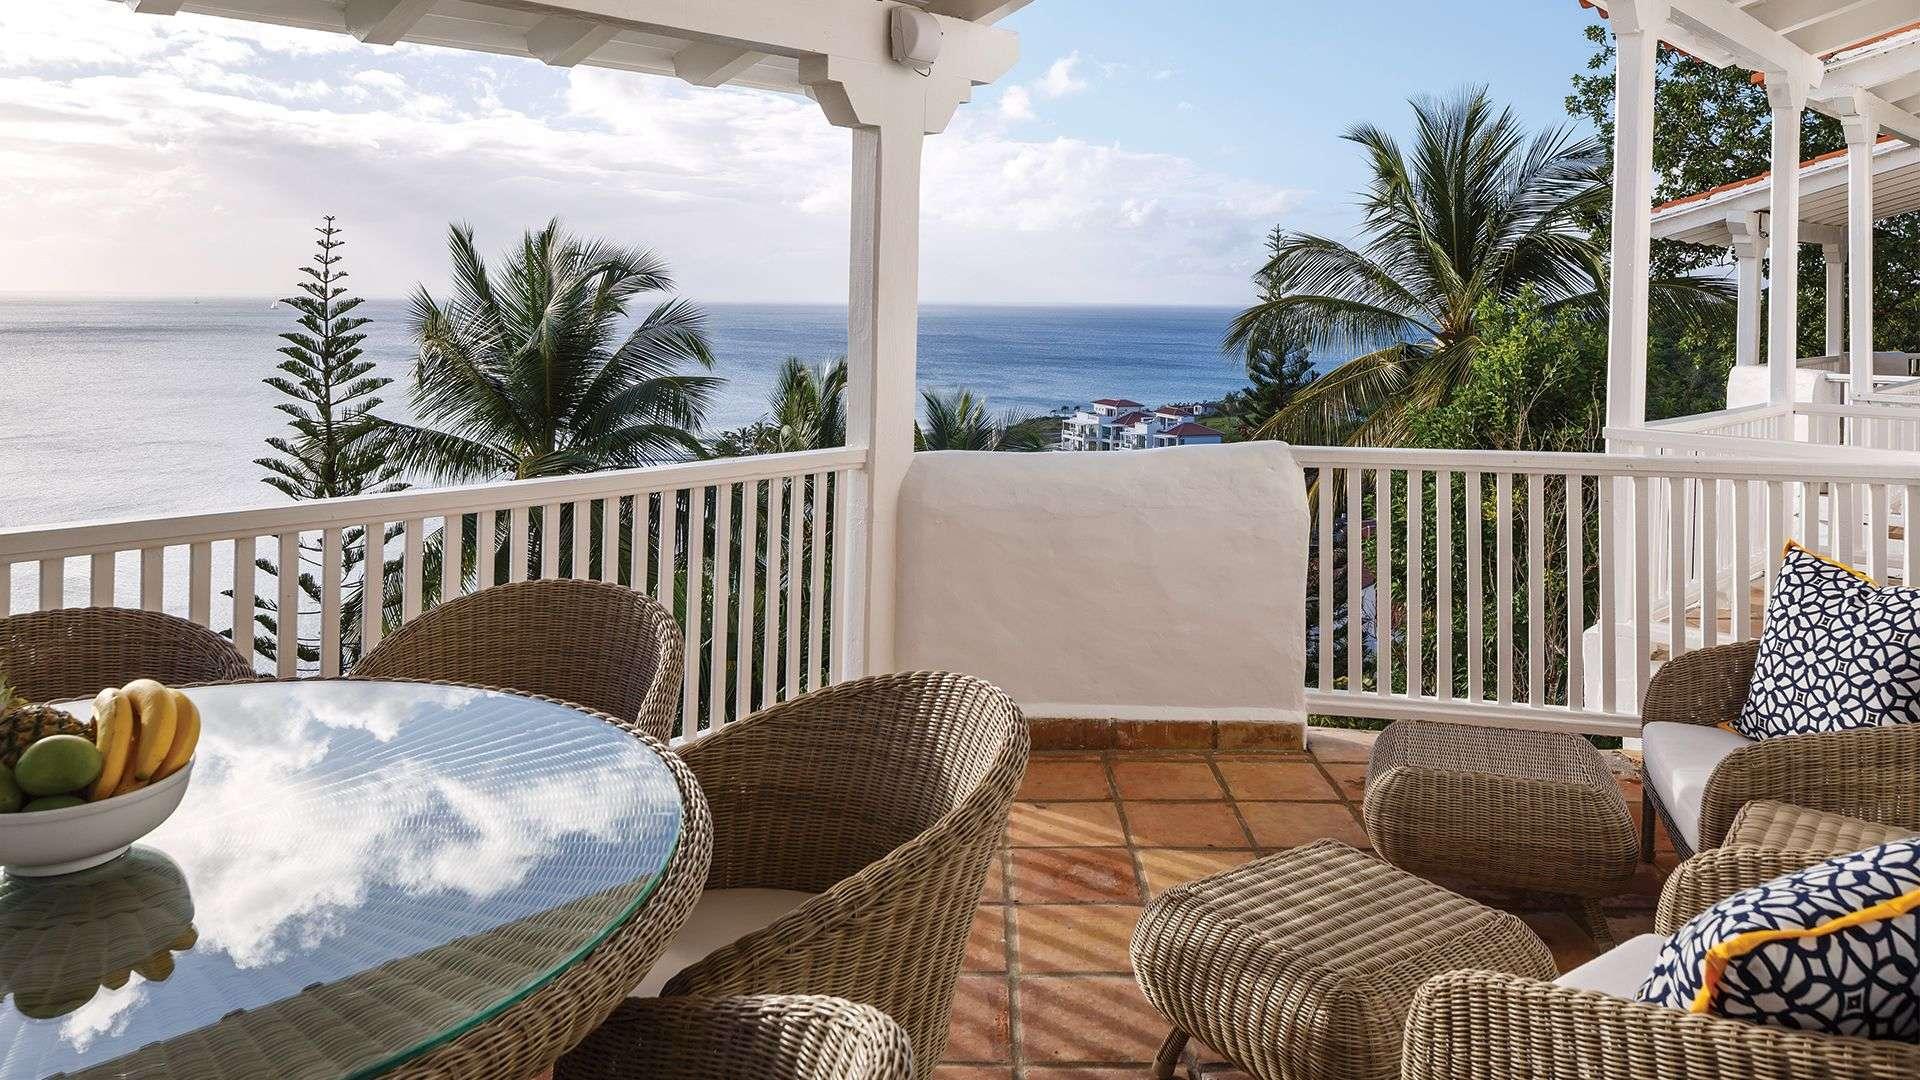 Luxury villa rentals caribbean - St lucia - Windjammer landing beach resort - No location 4 - Premium Three Bedroom Ocean View Villa - Image 1/14